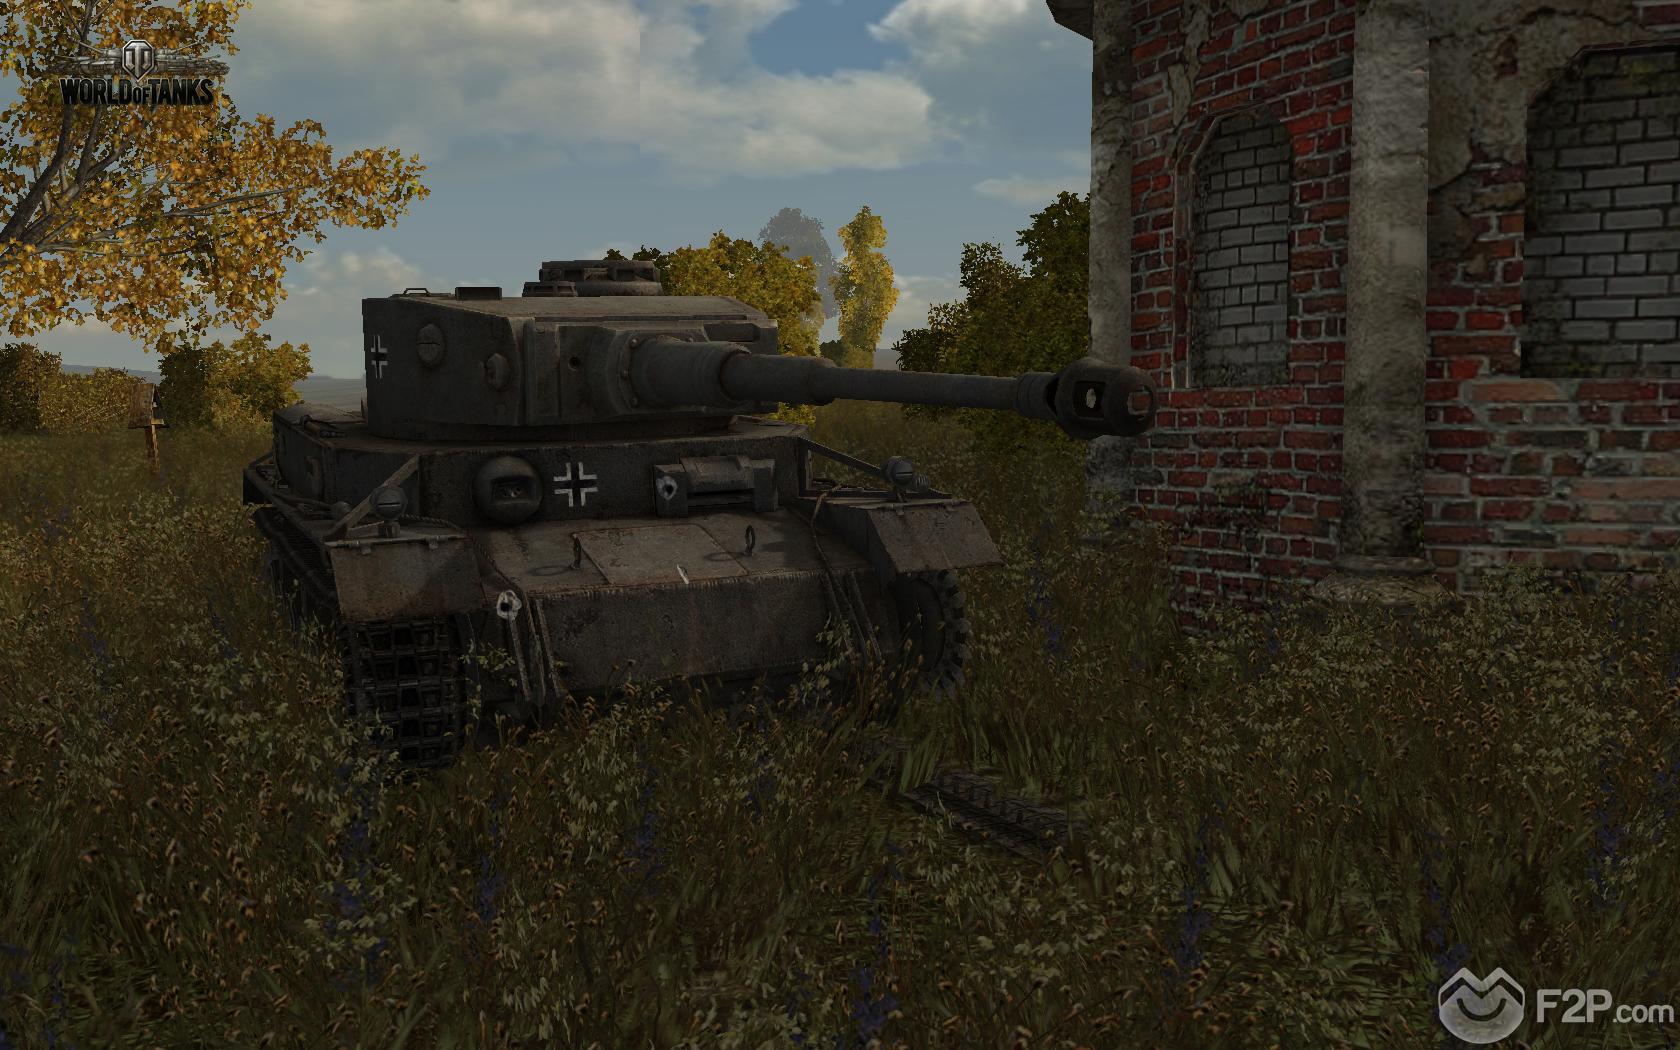 Click image for larger version.Name:World of Tanks 77.jpgViews:217Size:1.43 MBID:3990